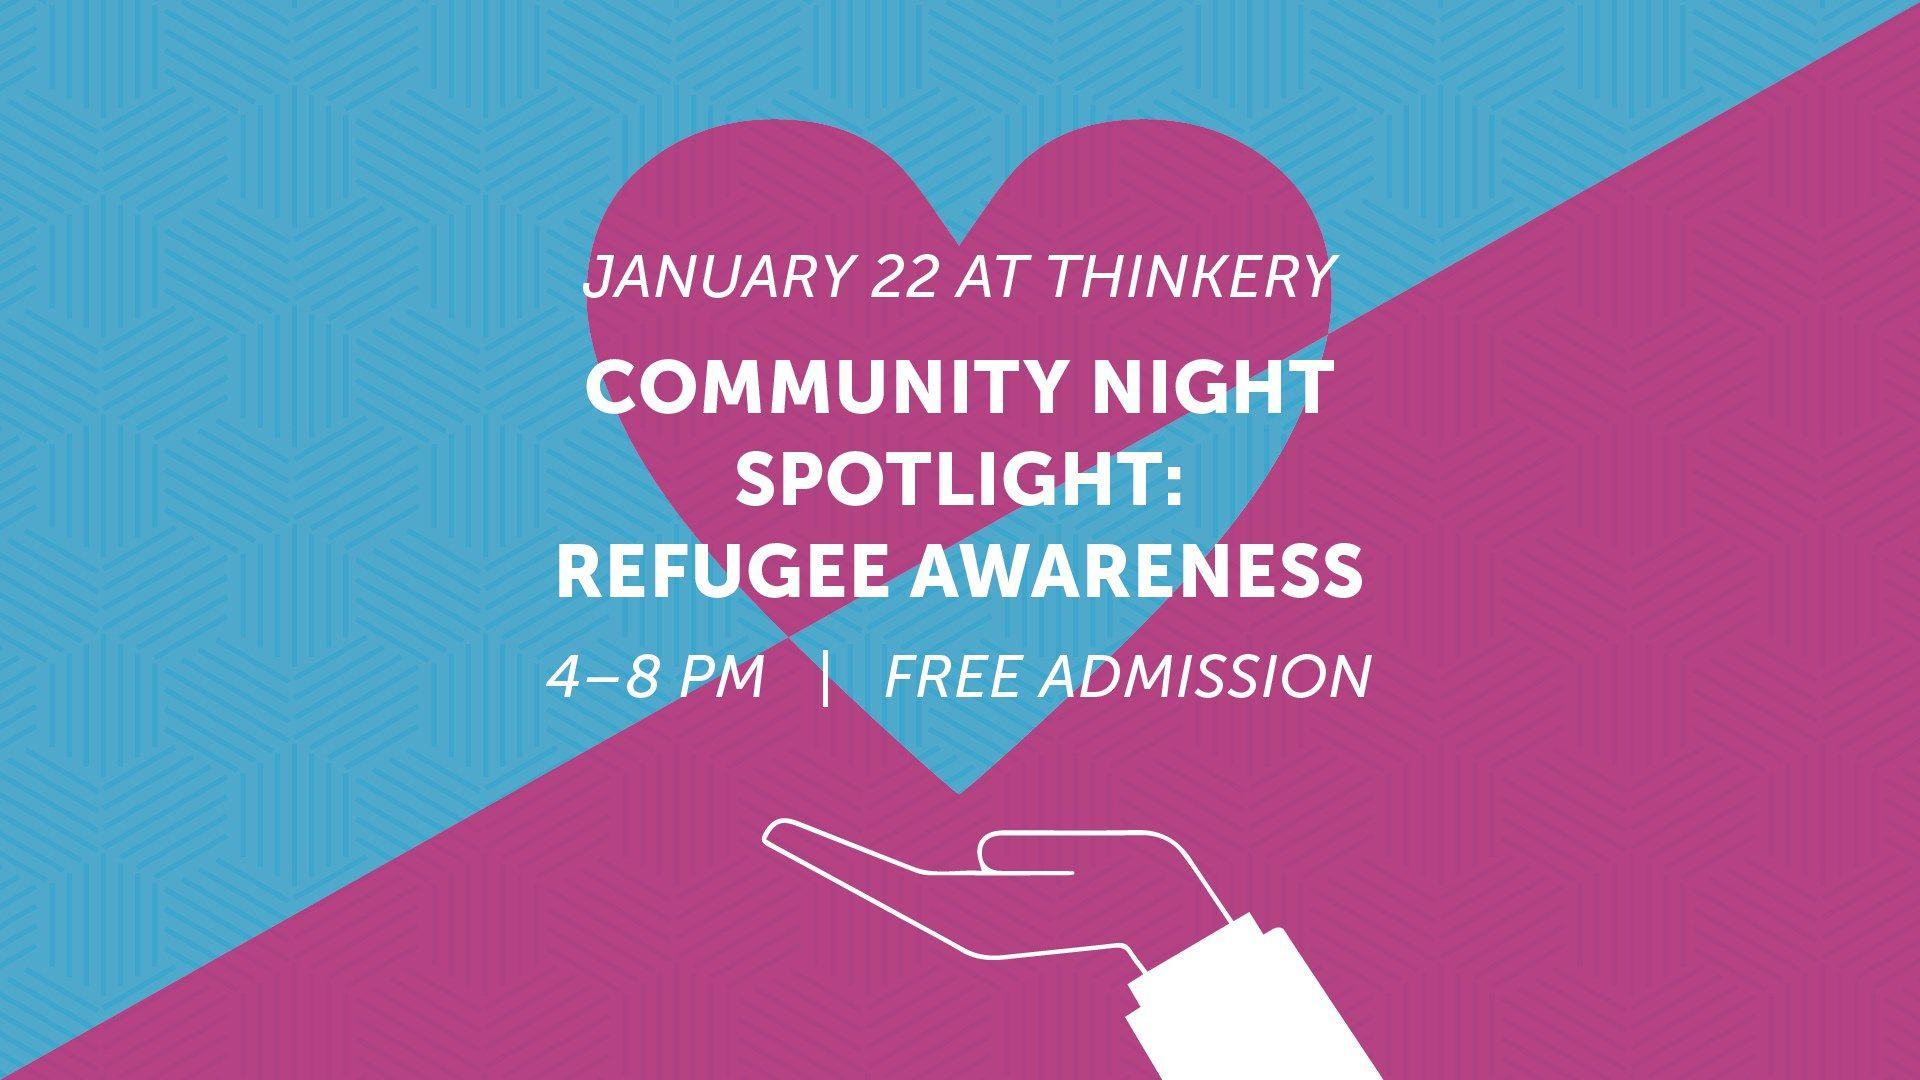 Community Night Spotlight: The Thinkery